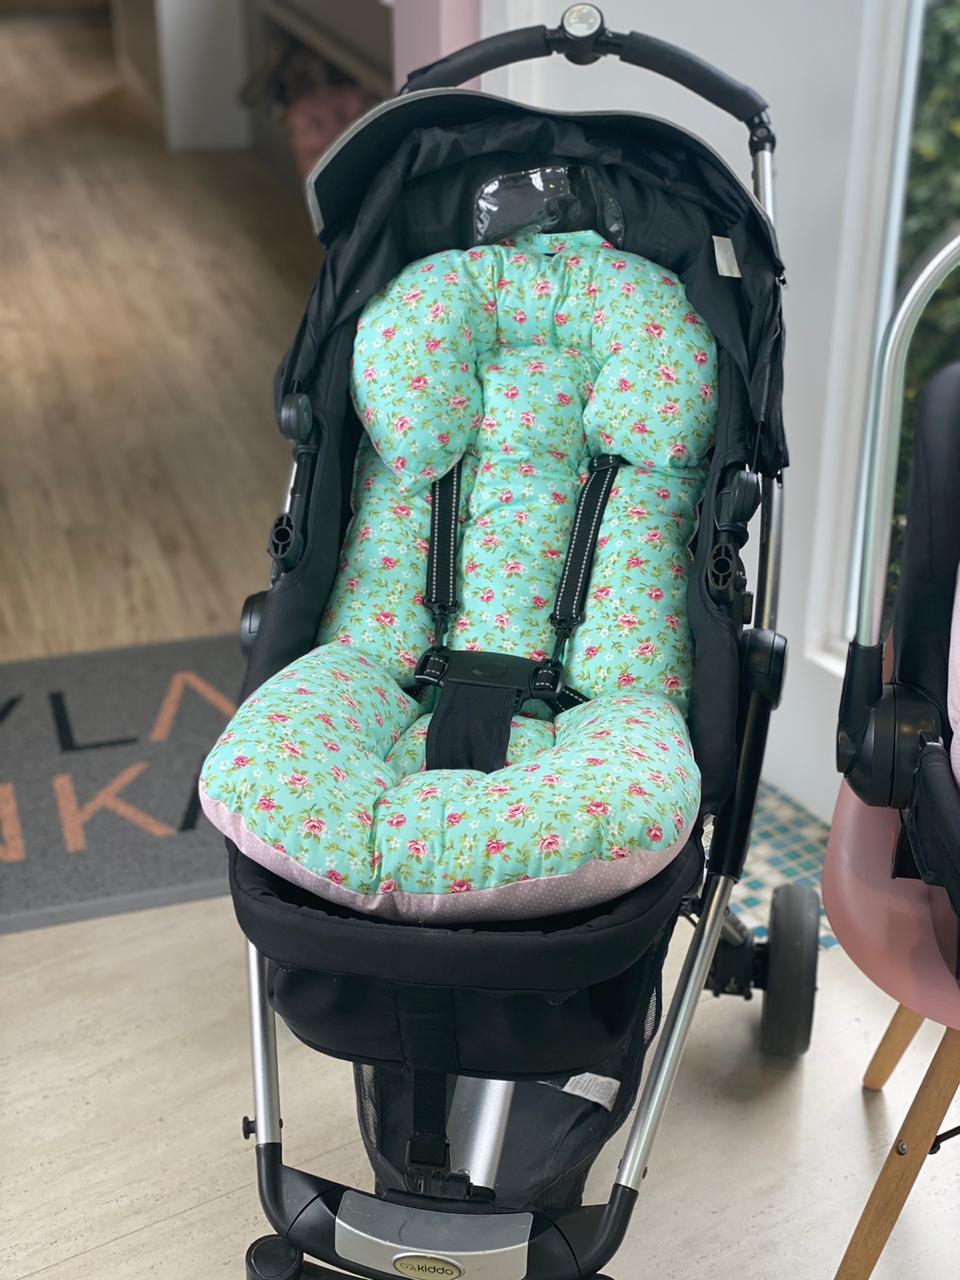 Kit Colchão Carrinho e Bebê Conforto - Floral Poá Rosa